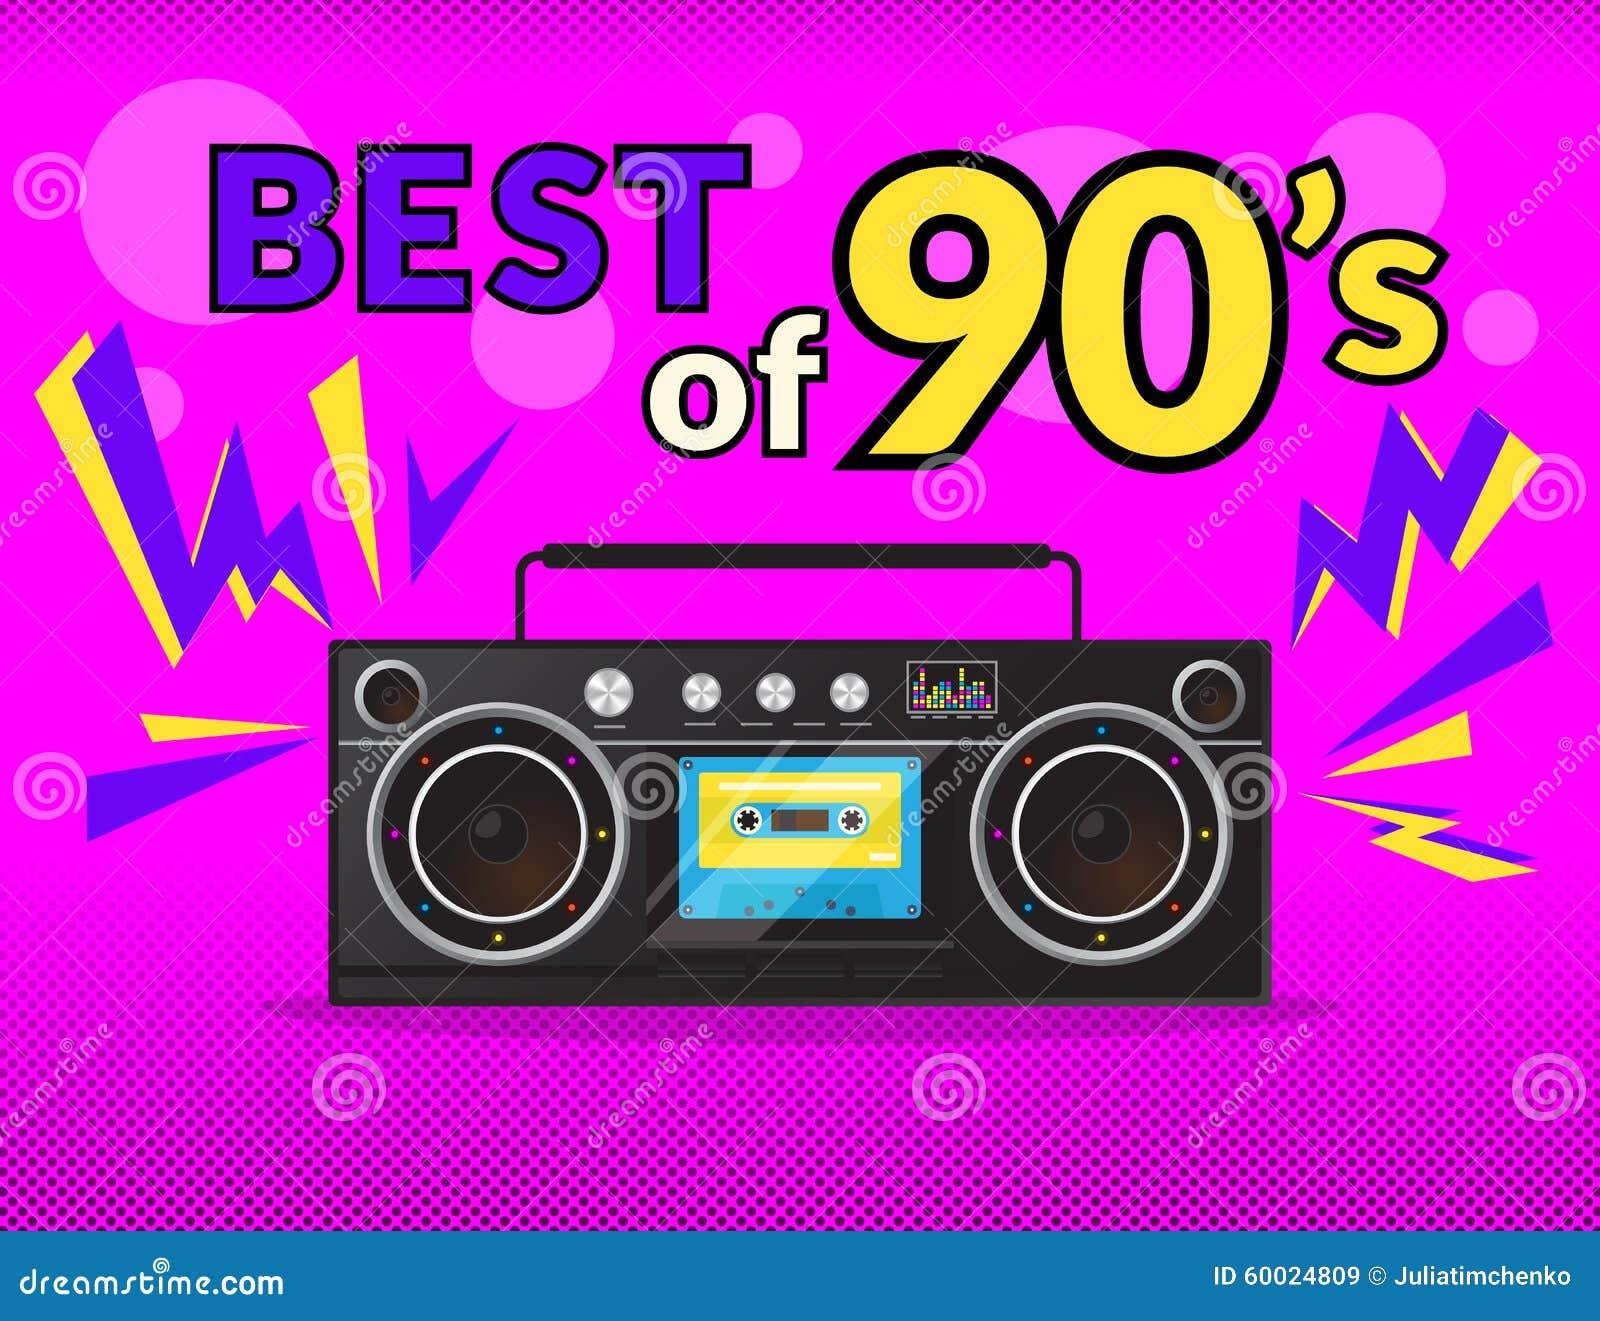 Best Of 90s Stock Vector. Illustration Of Dance